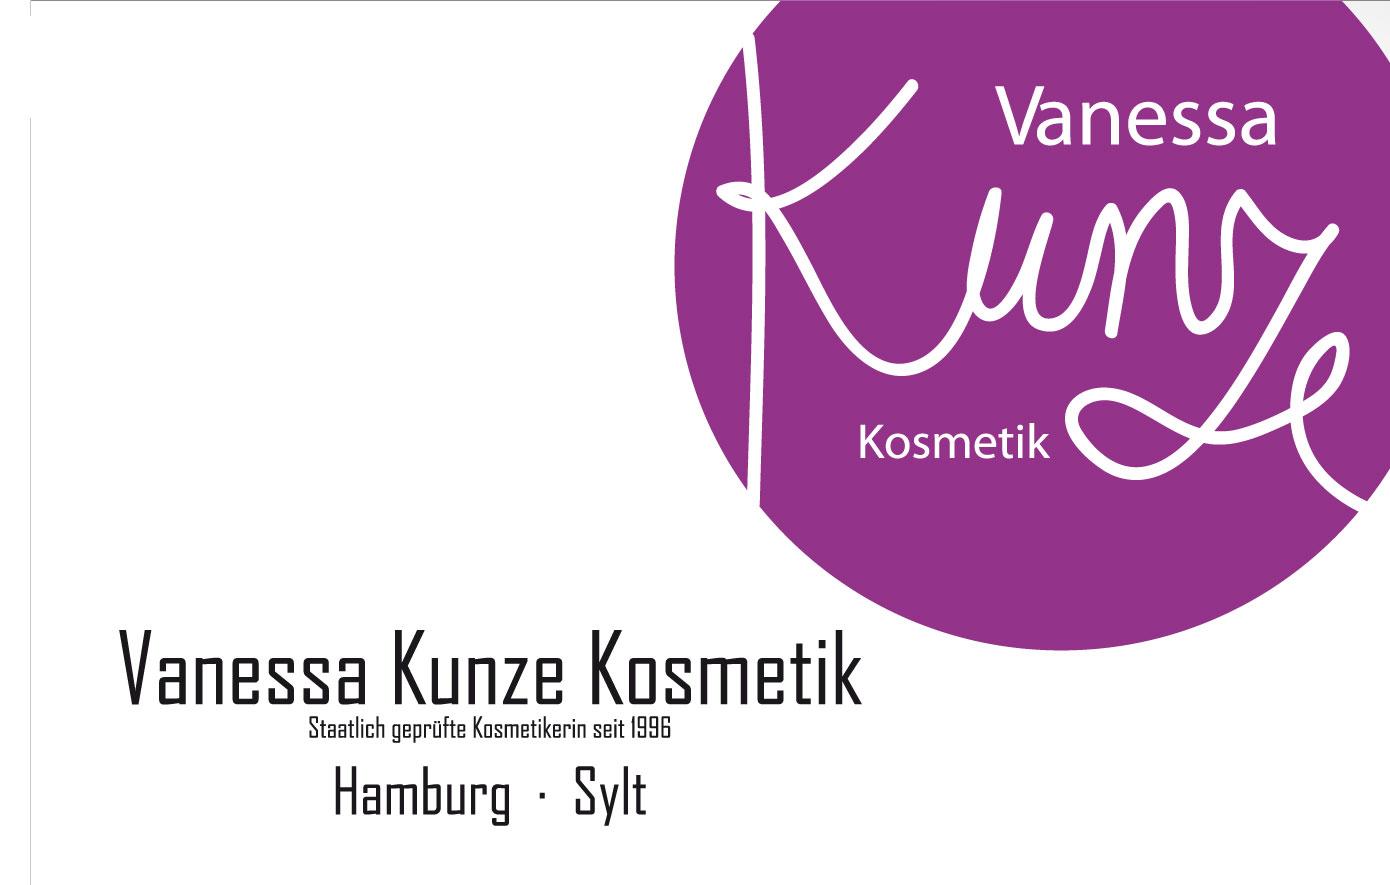 Vanessa Kunze Kosmetik Hamburg